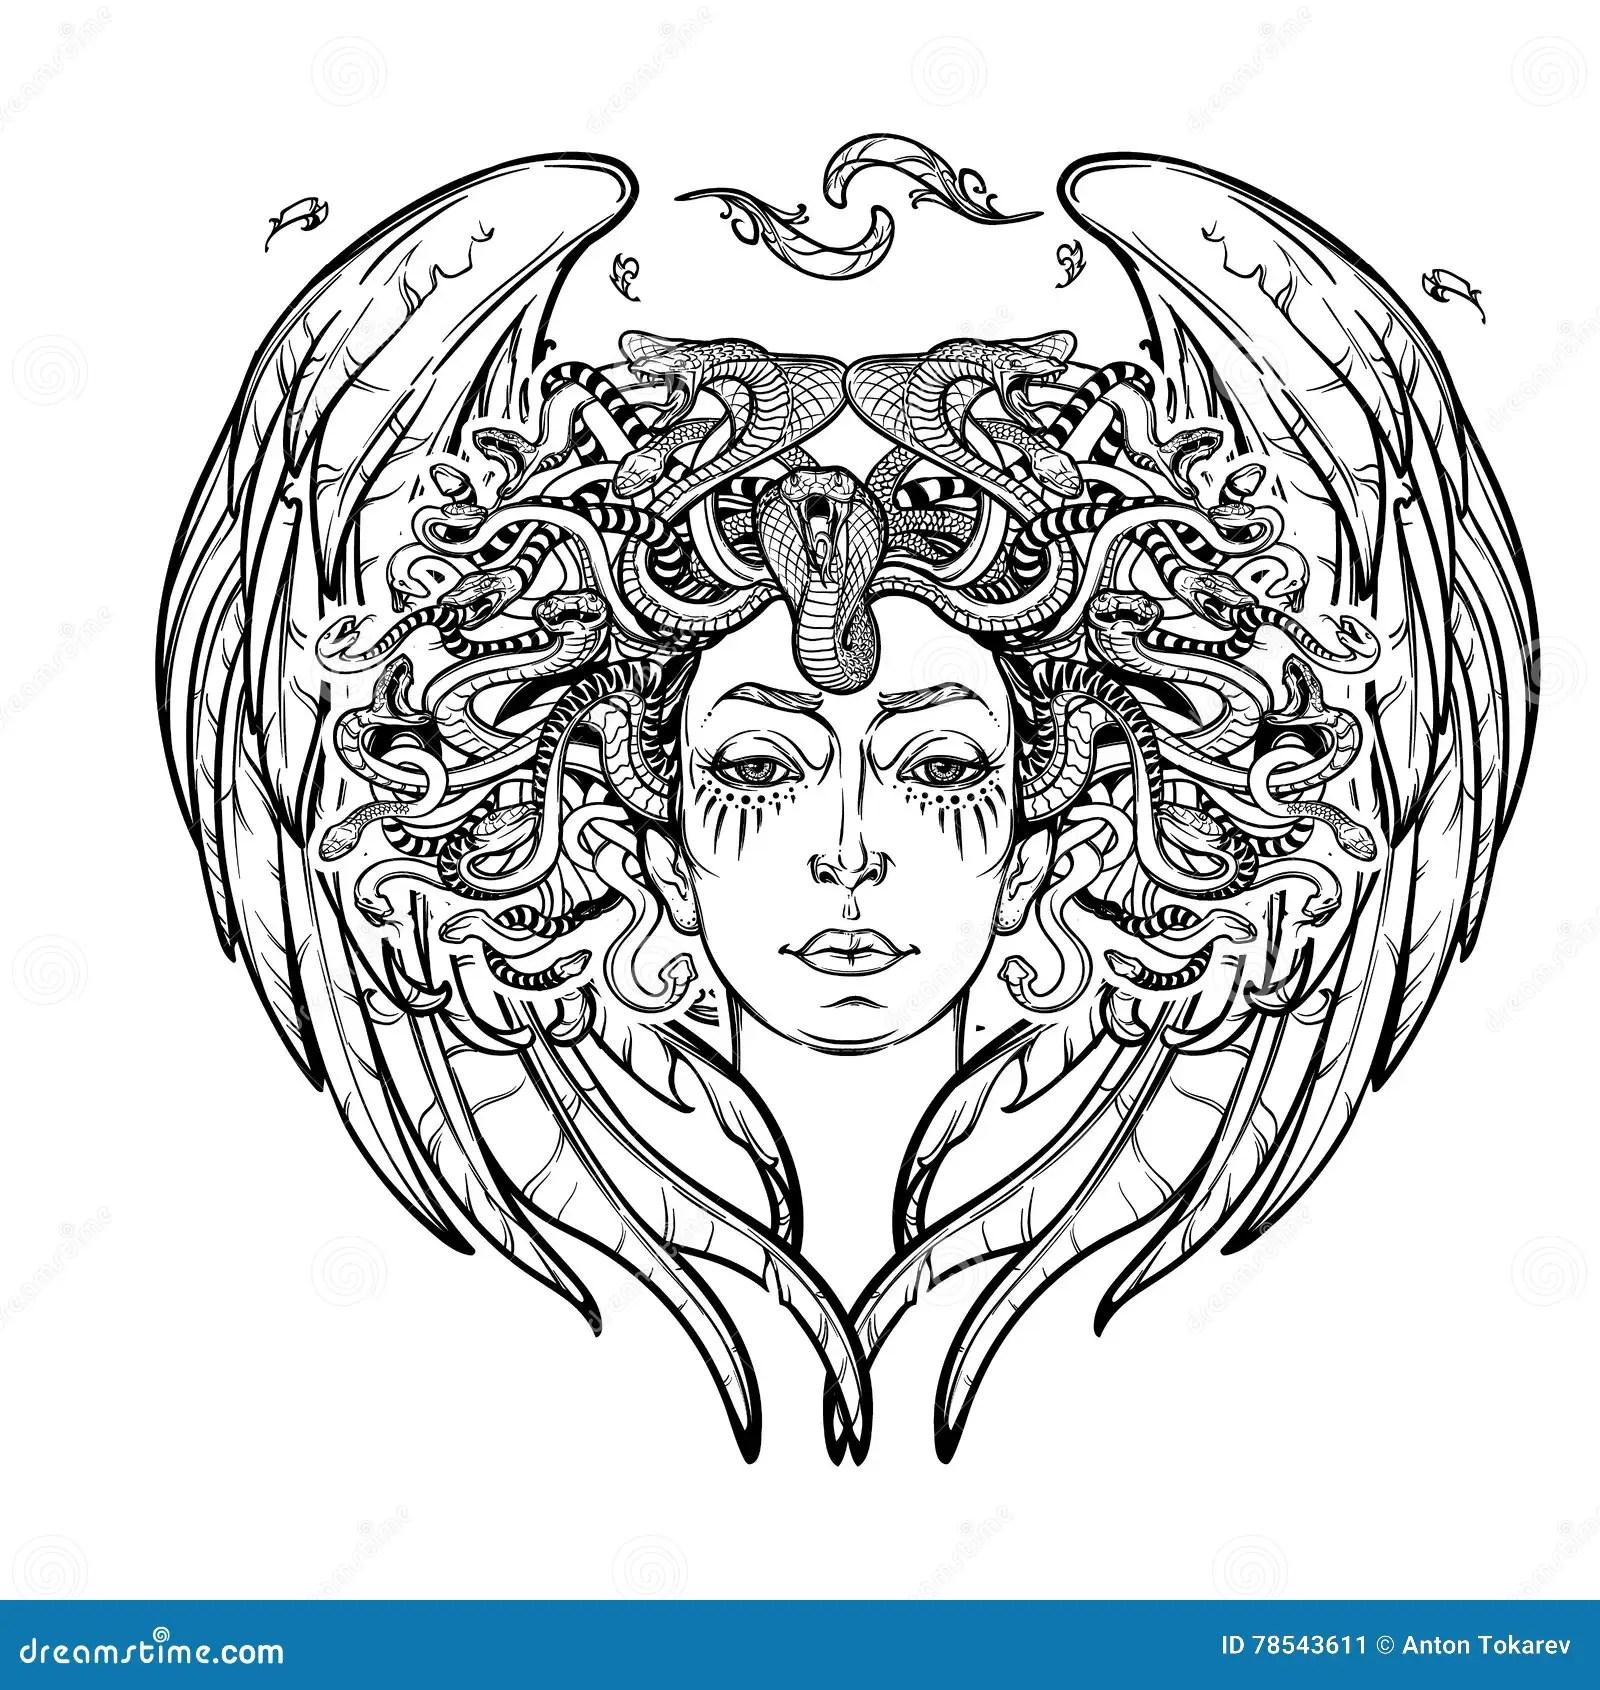 Medusa Gorgon Bw Sketch Stock Vector Illustration Of